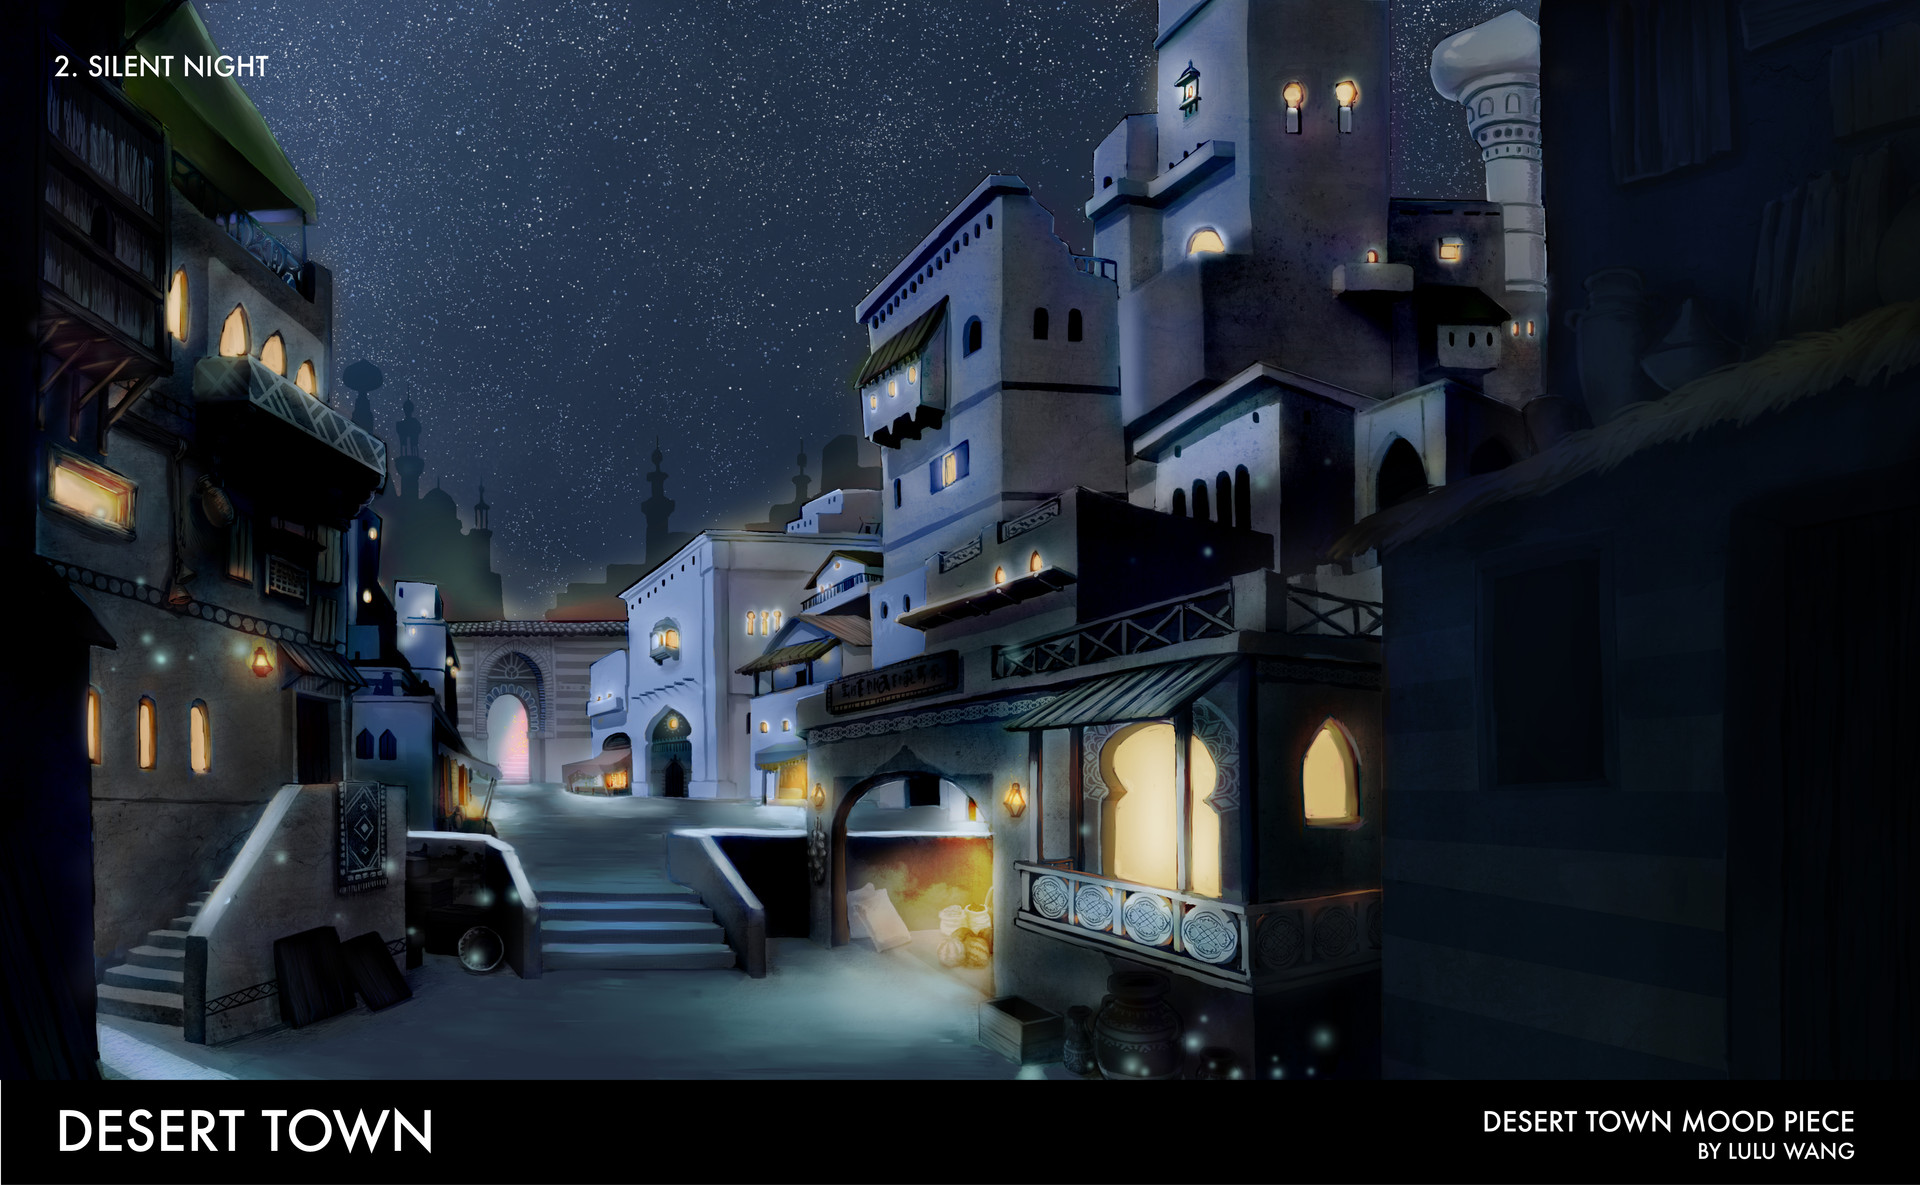 deserttowncallouts2.jpg